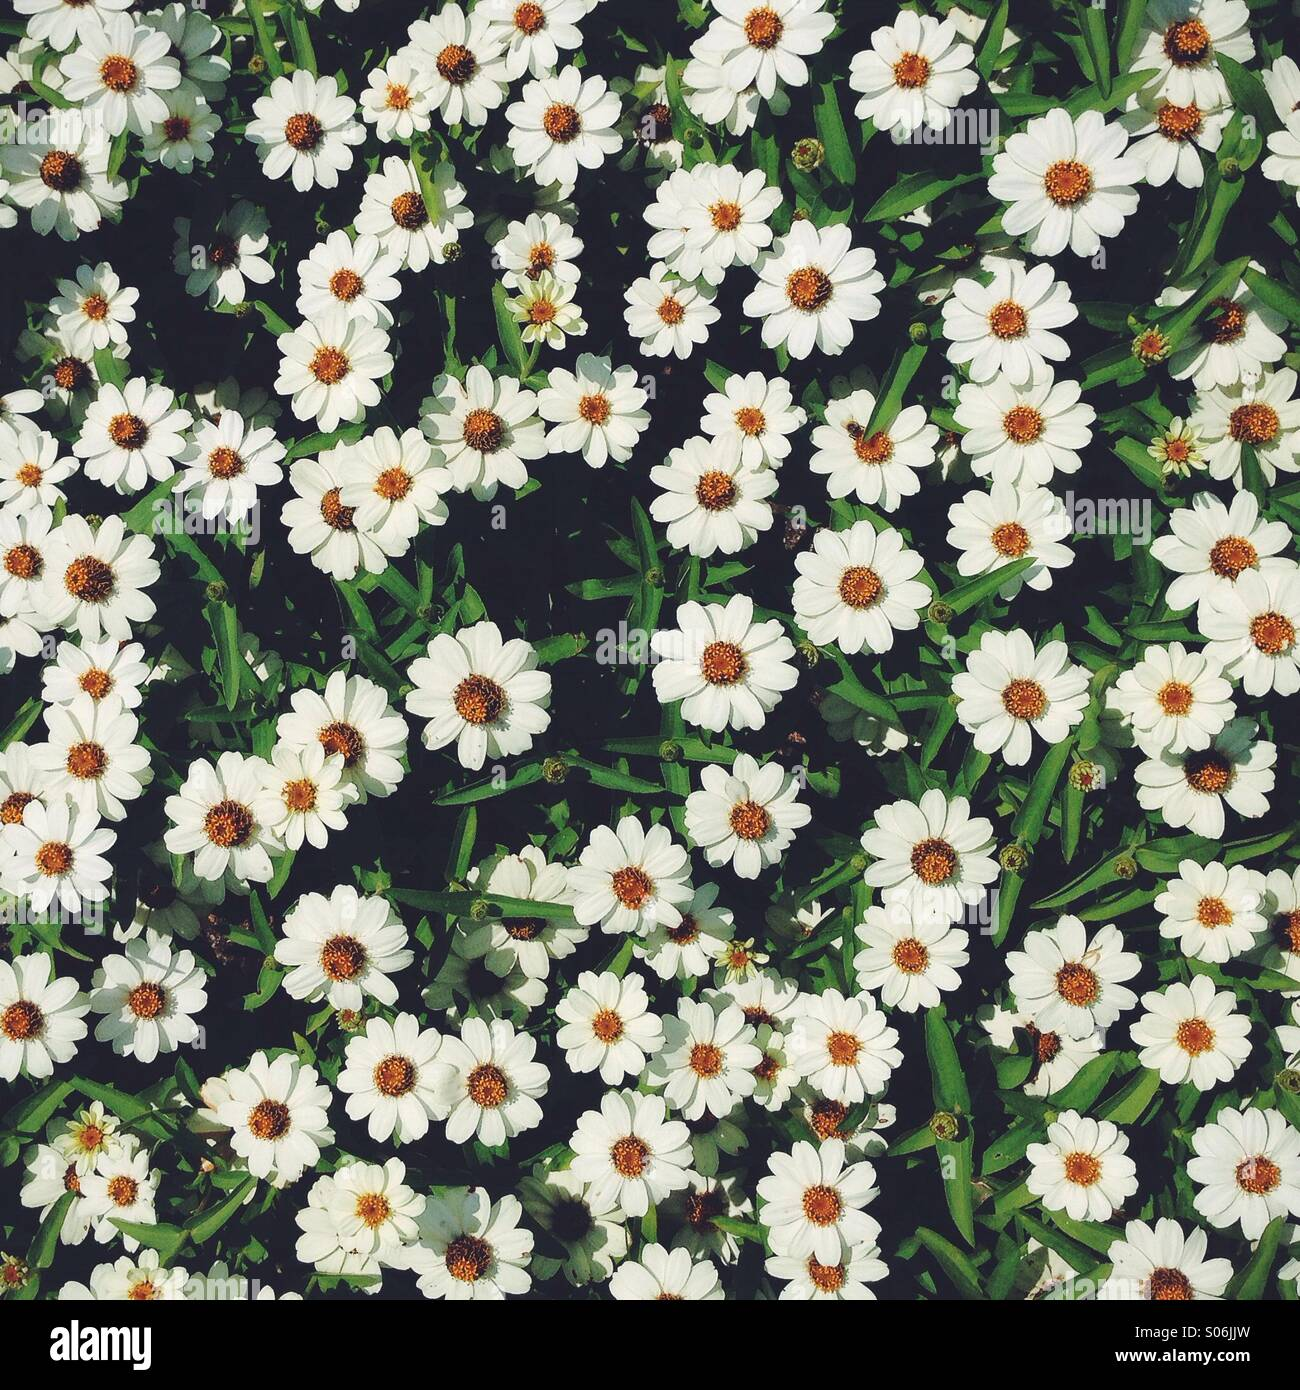 Daisies - Stock Image